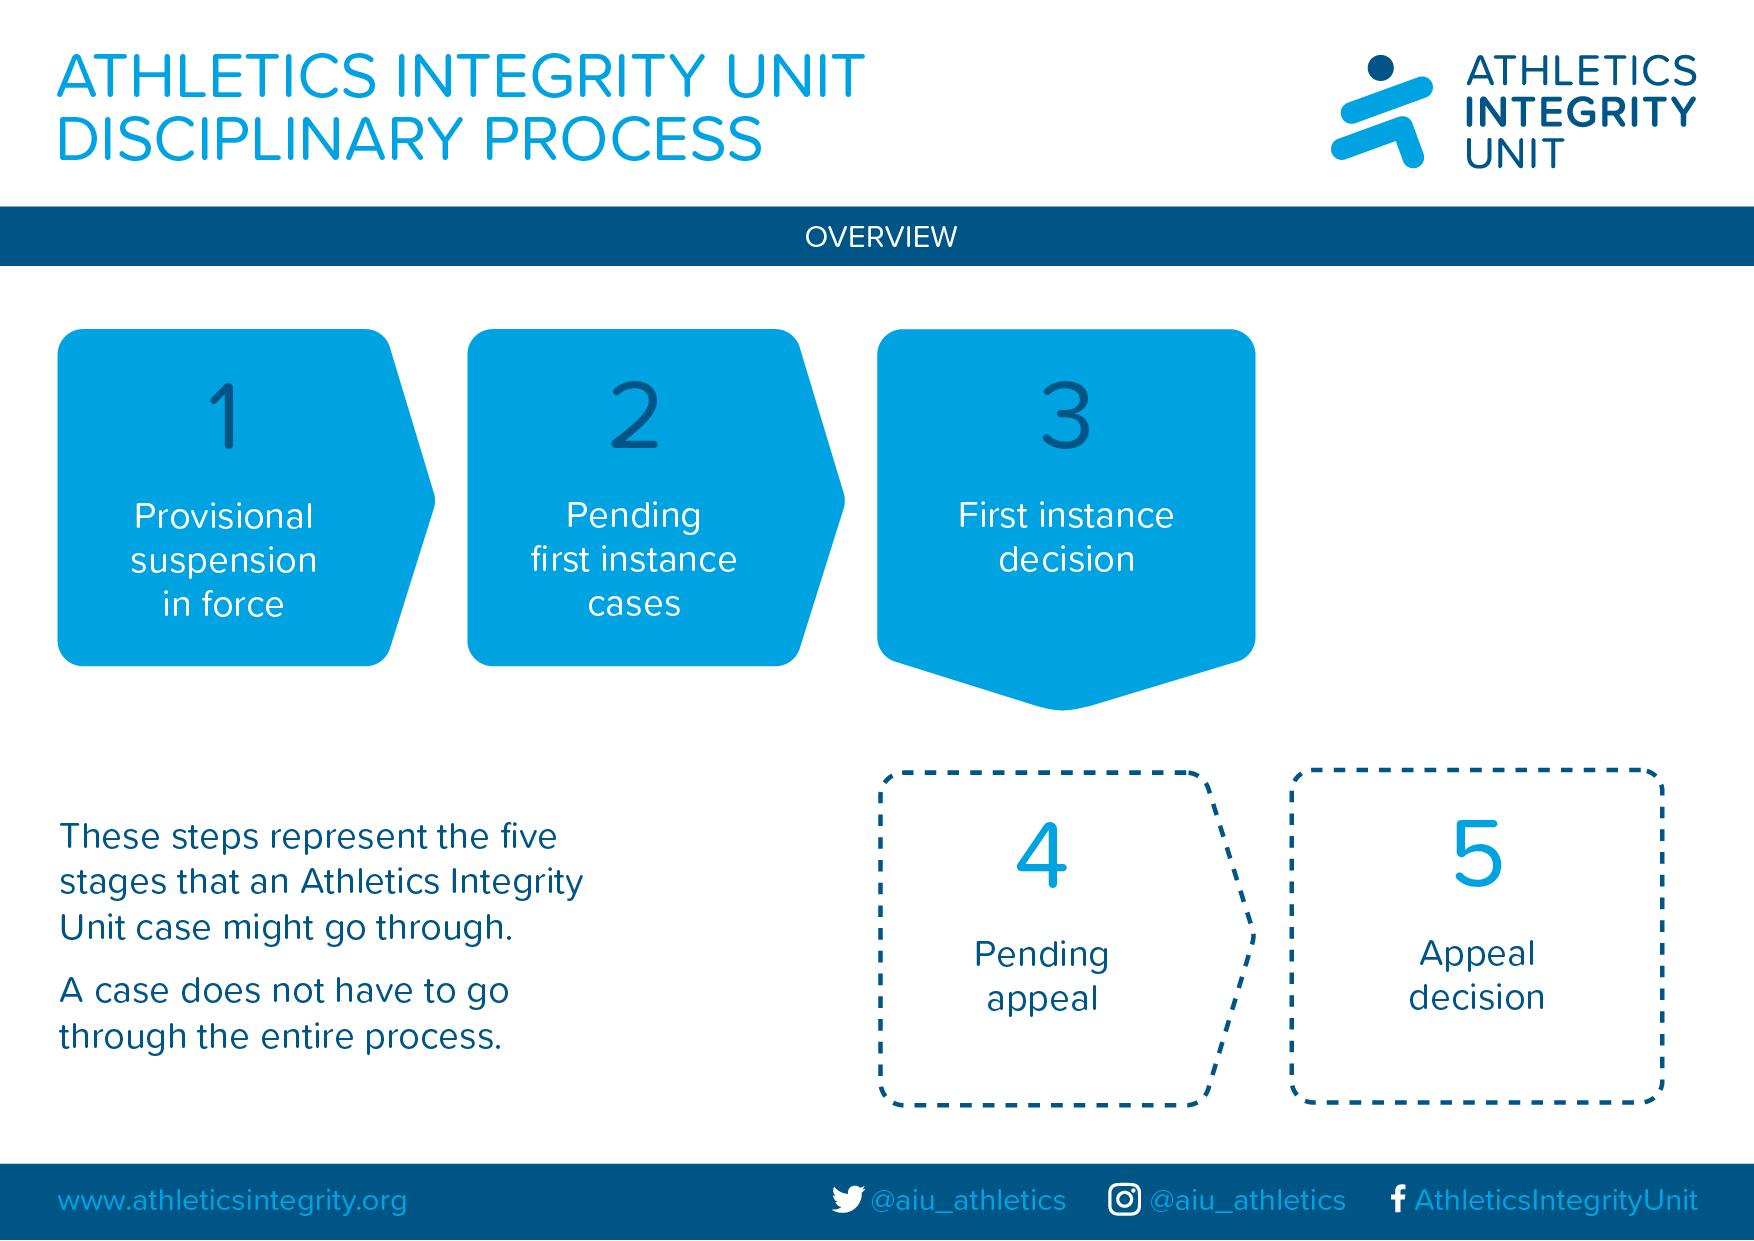 AIU-process-overview-1.png#asset:2550